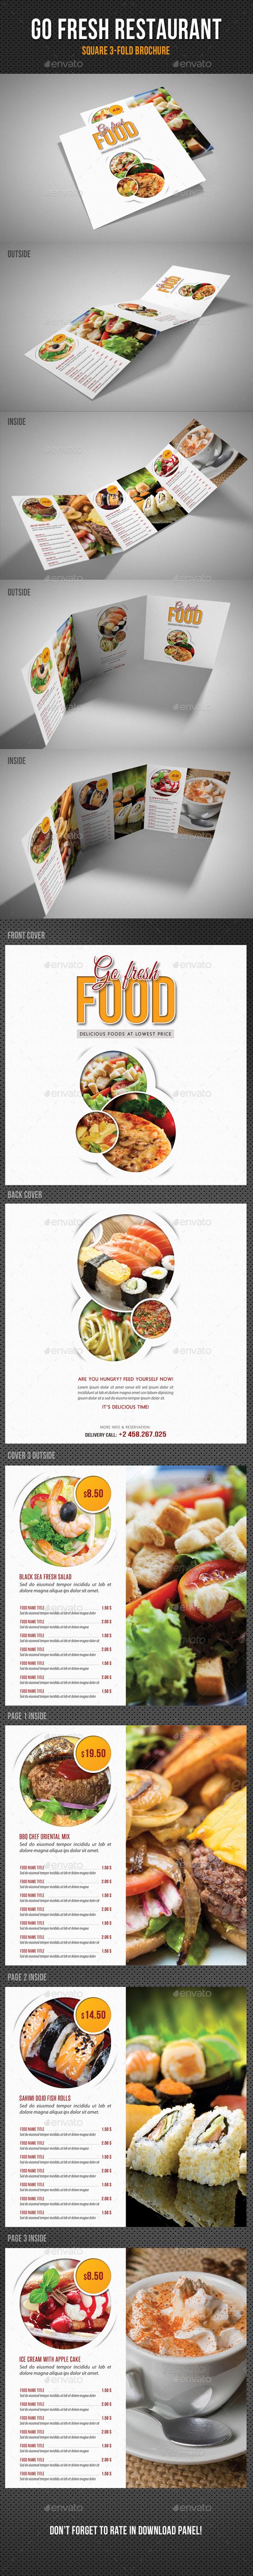 Go Fresh Restaurant Food Square 3-Fold Brochure - Food Menus Print Templates